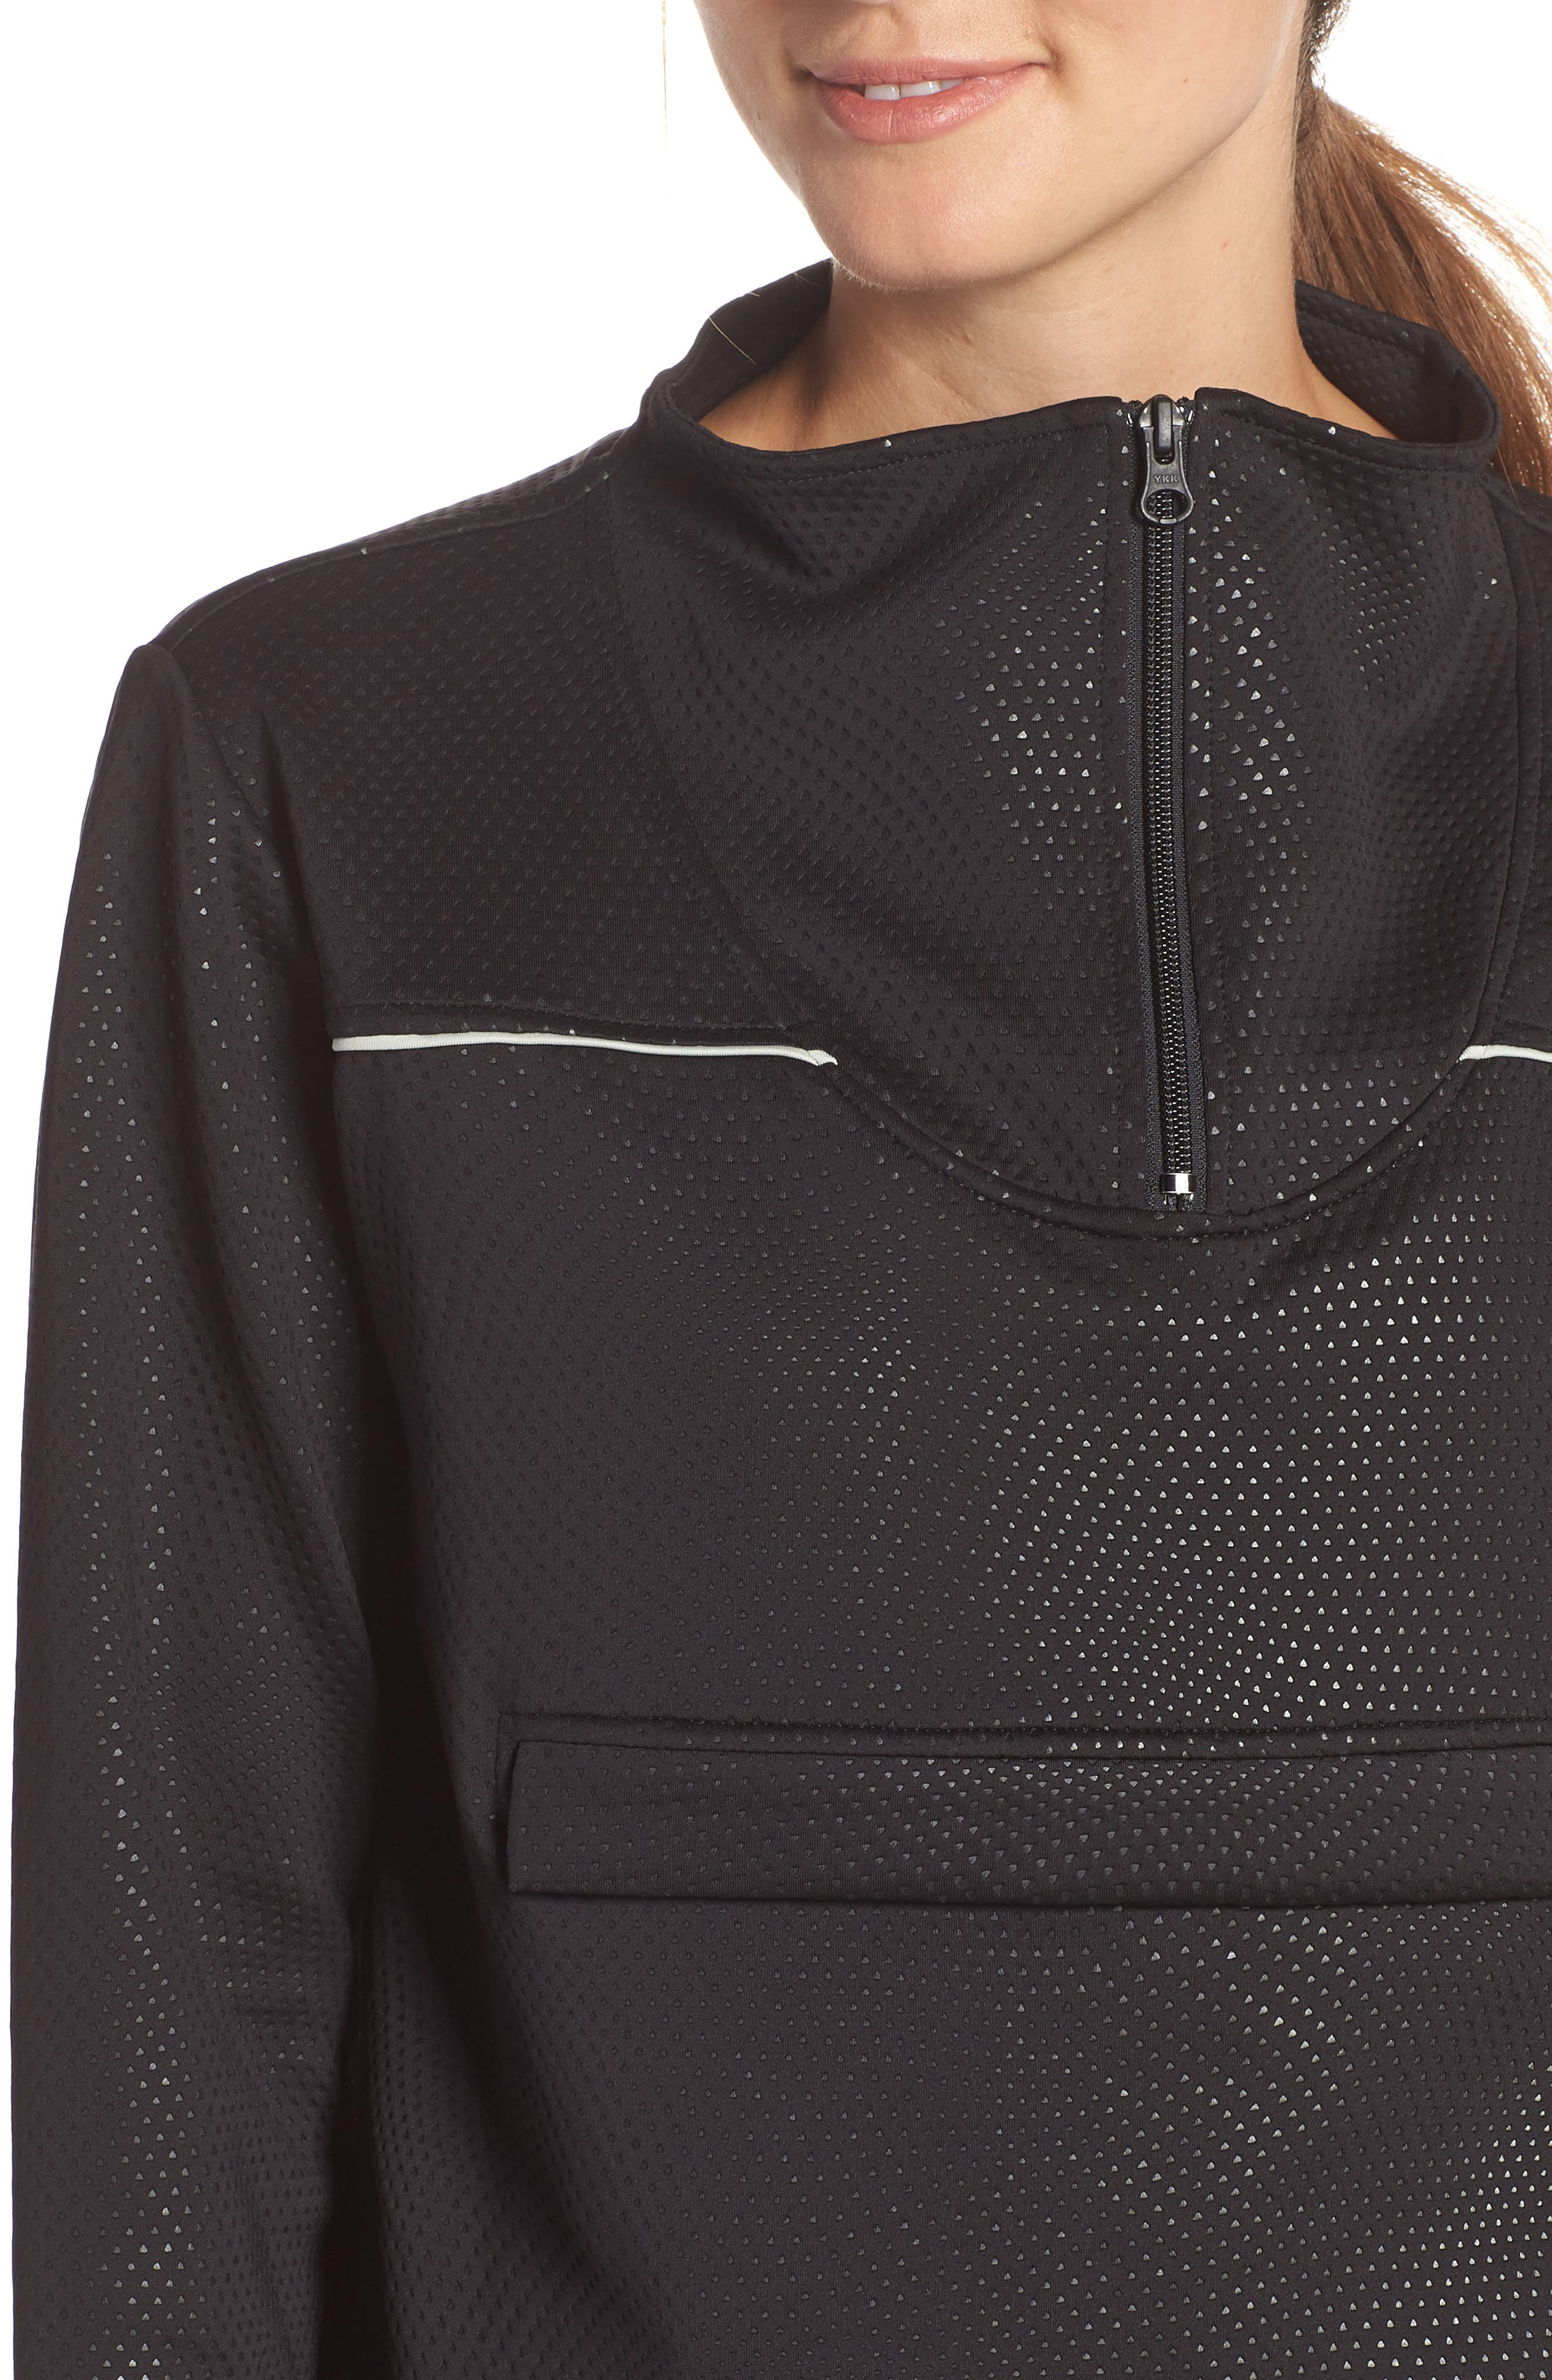 Kai Etch Half-Zip Sweatshirt,                             Alternate thumbnail 4, color,                             001